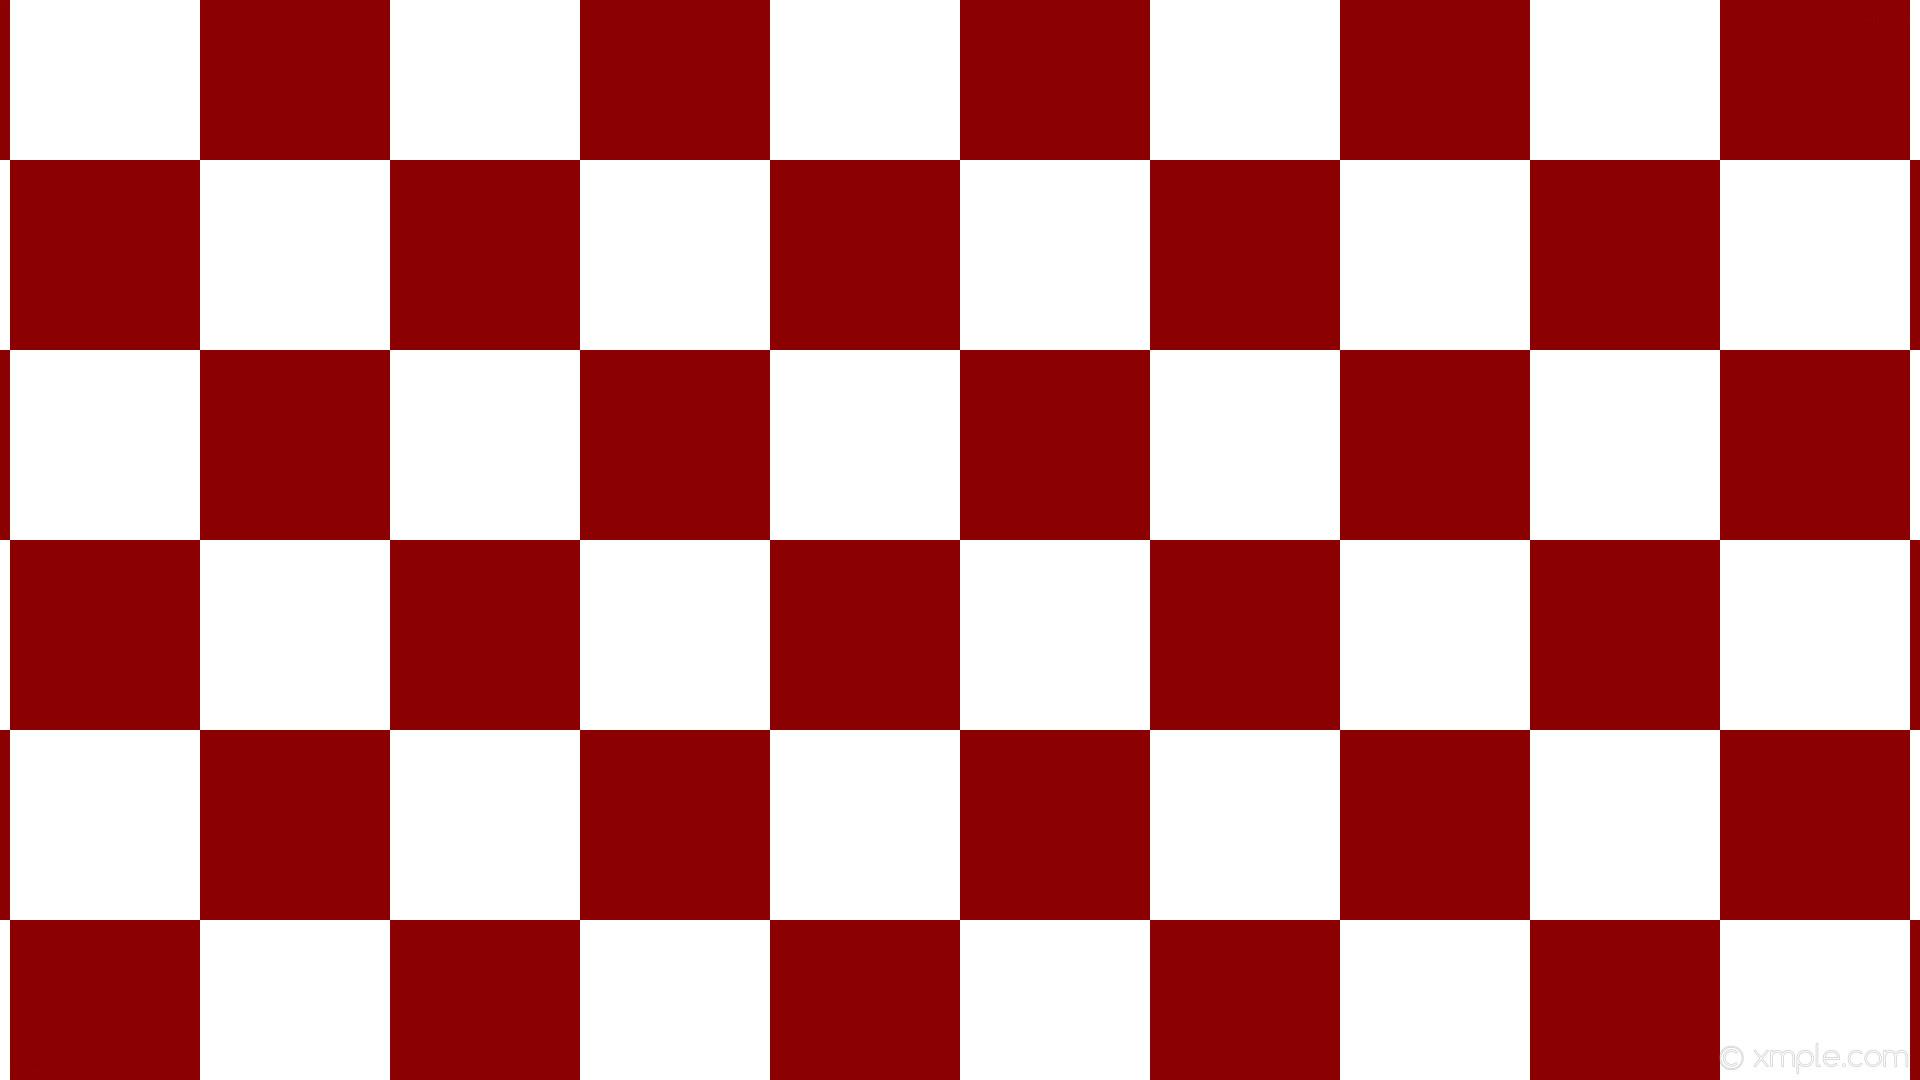 wallpaper checkered red white squares dark red #ffffff #8b0000 diagonal 0°  190px